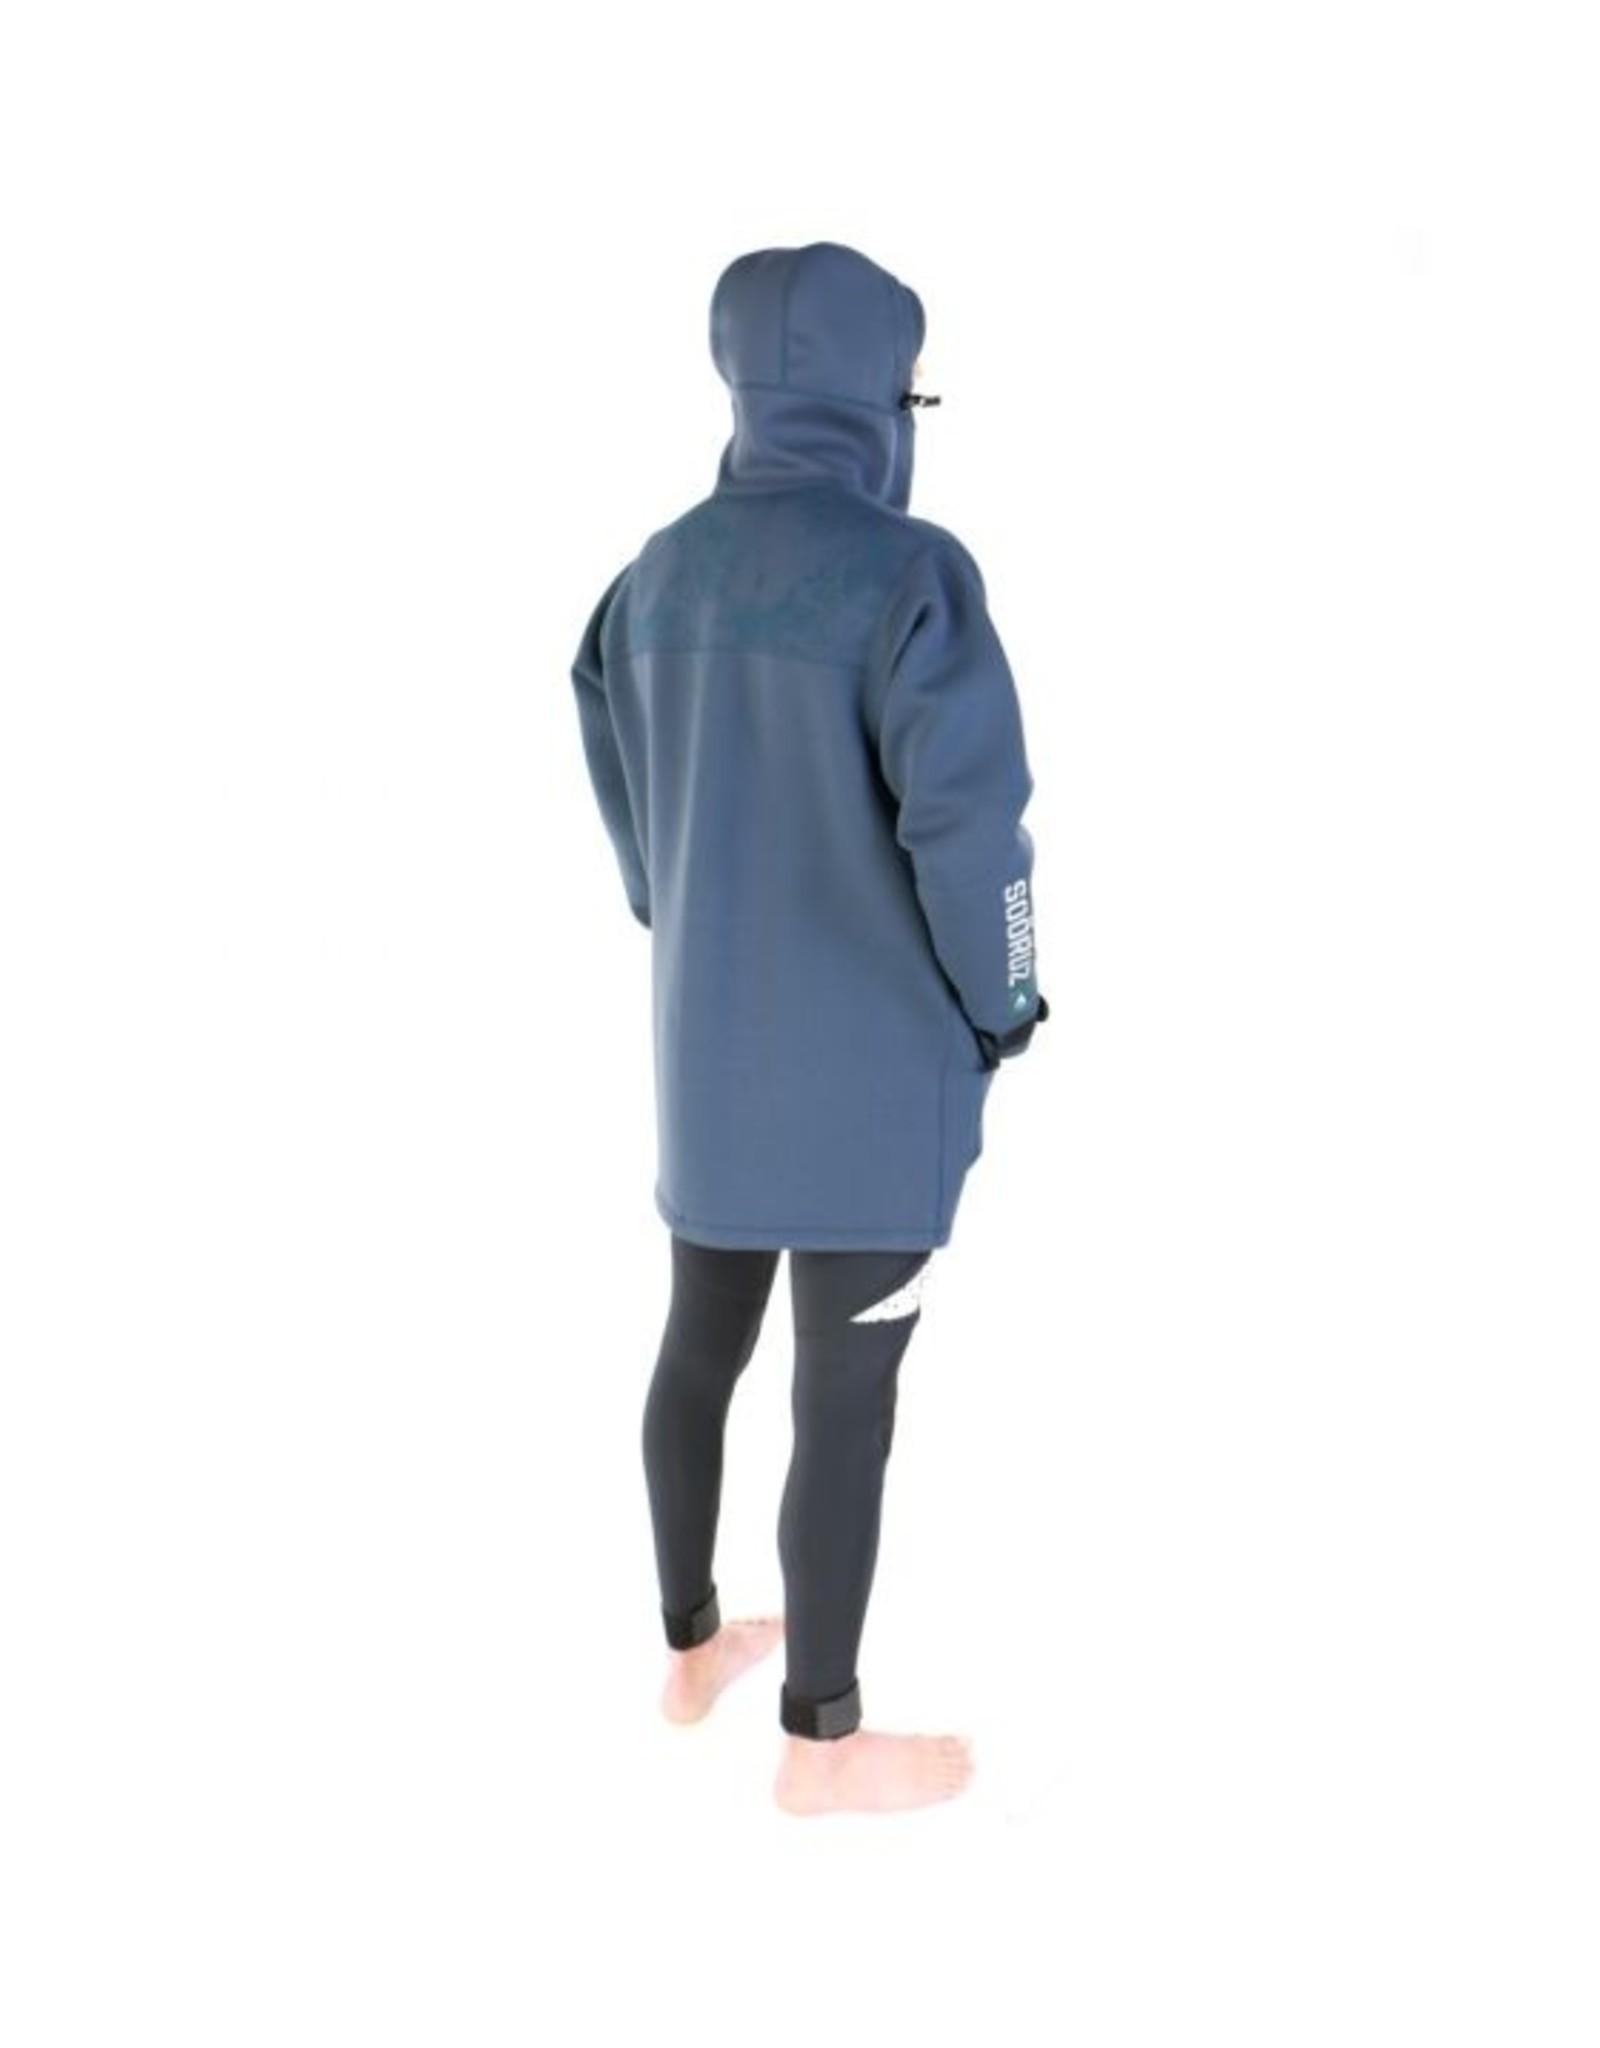 Sooruz Neo Jacket 2/2 STRAP Recycled Polyester